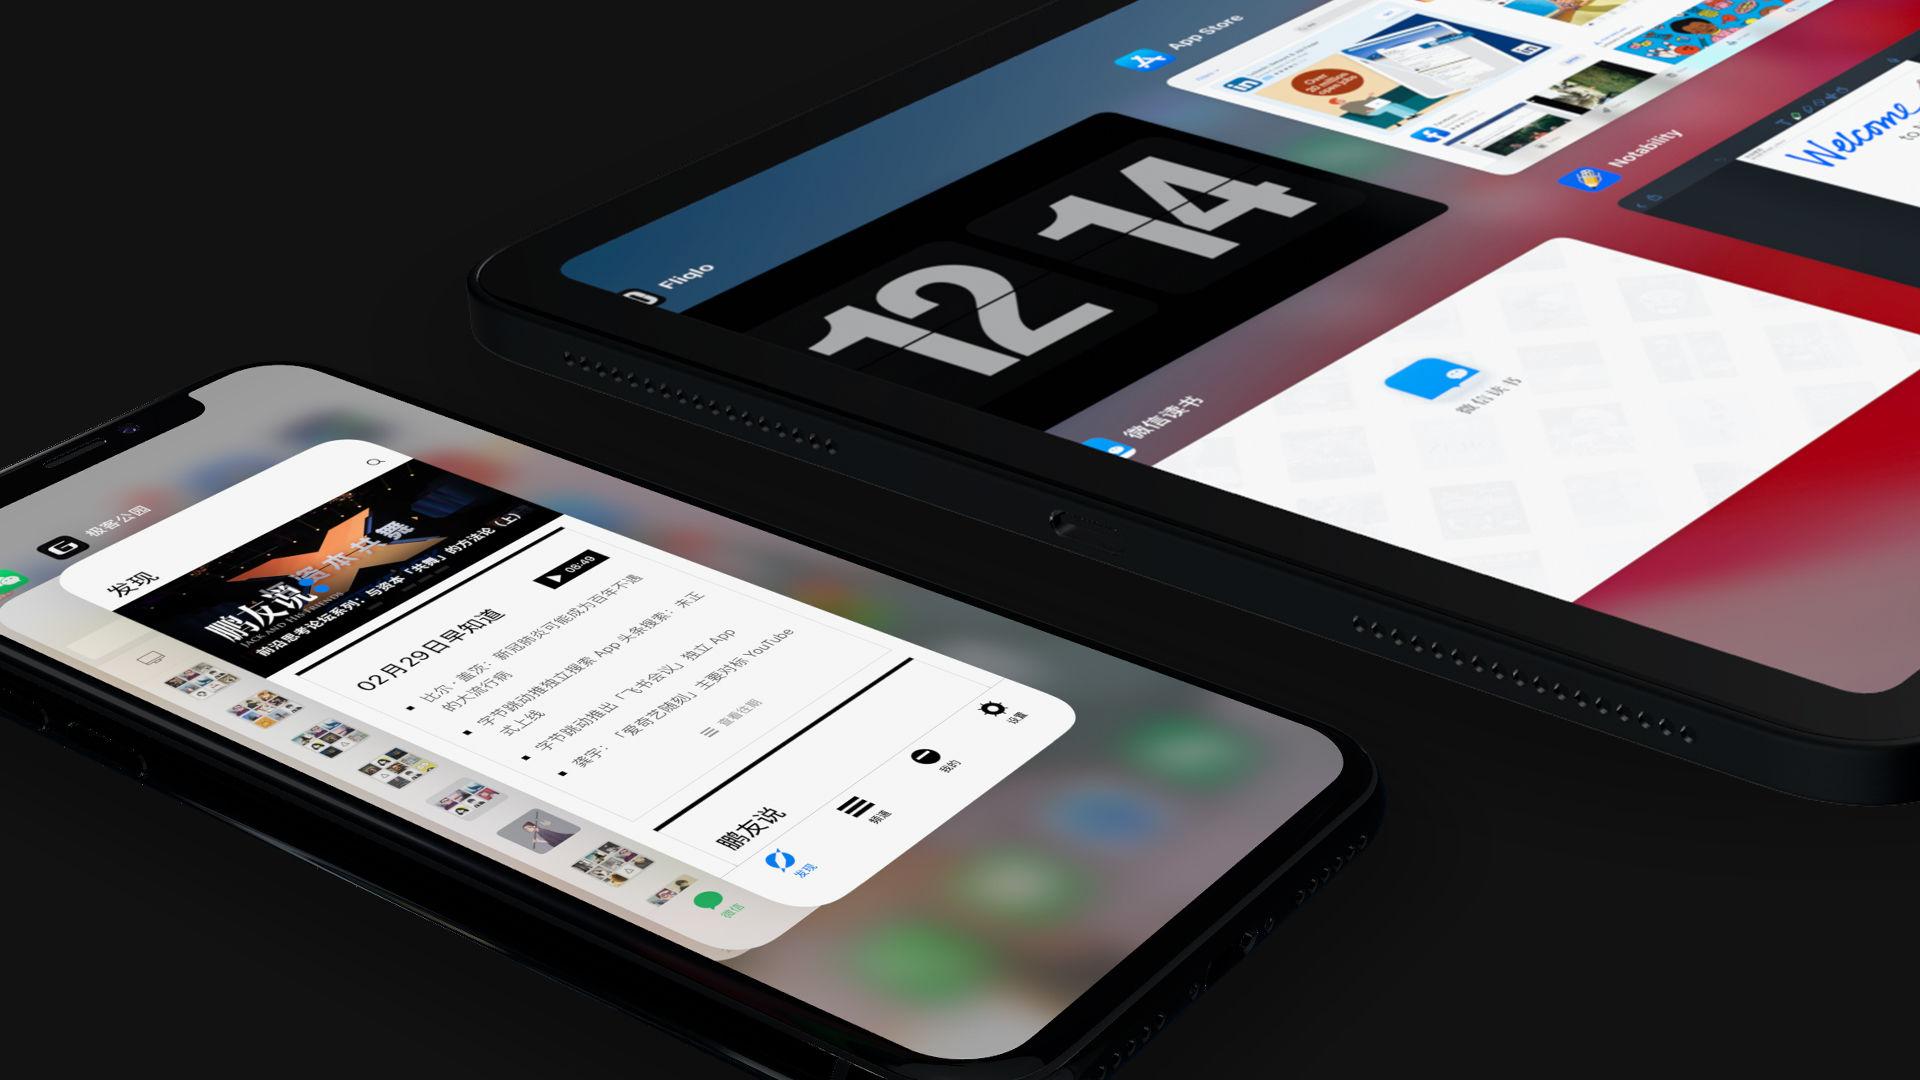 5e5cfb6a8f5b6 - 滑动关闭 App 不能让 iPhone 变快,科技发展还给我们留下哪些后遗症?